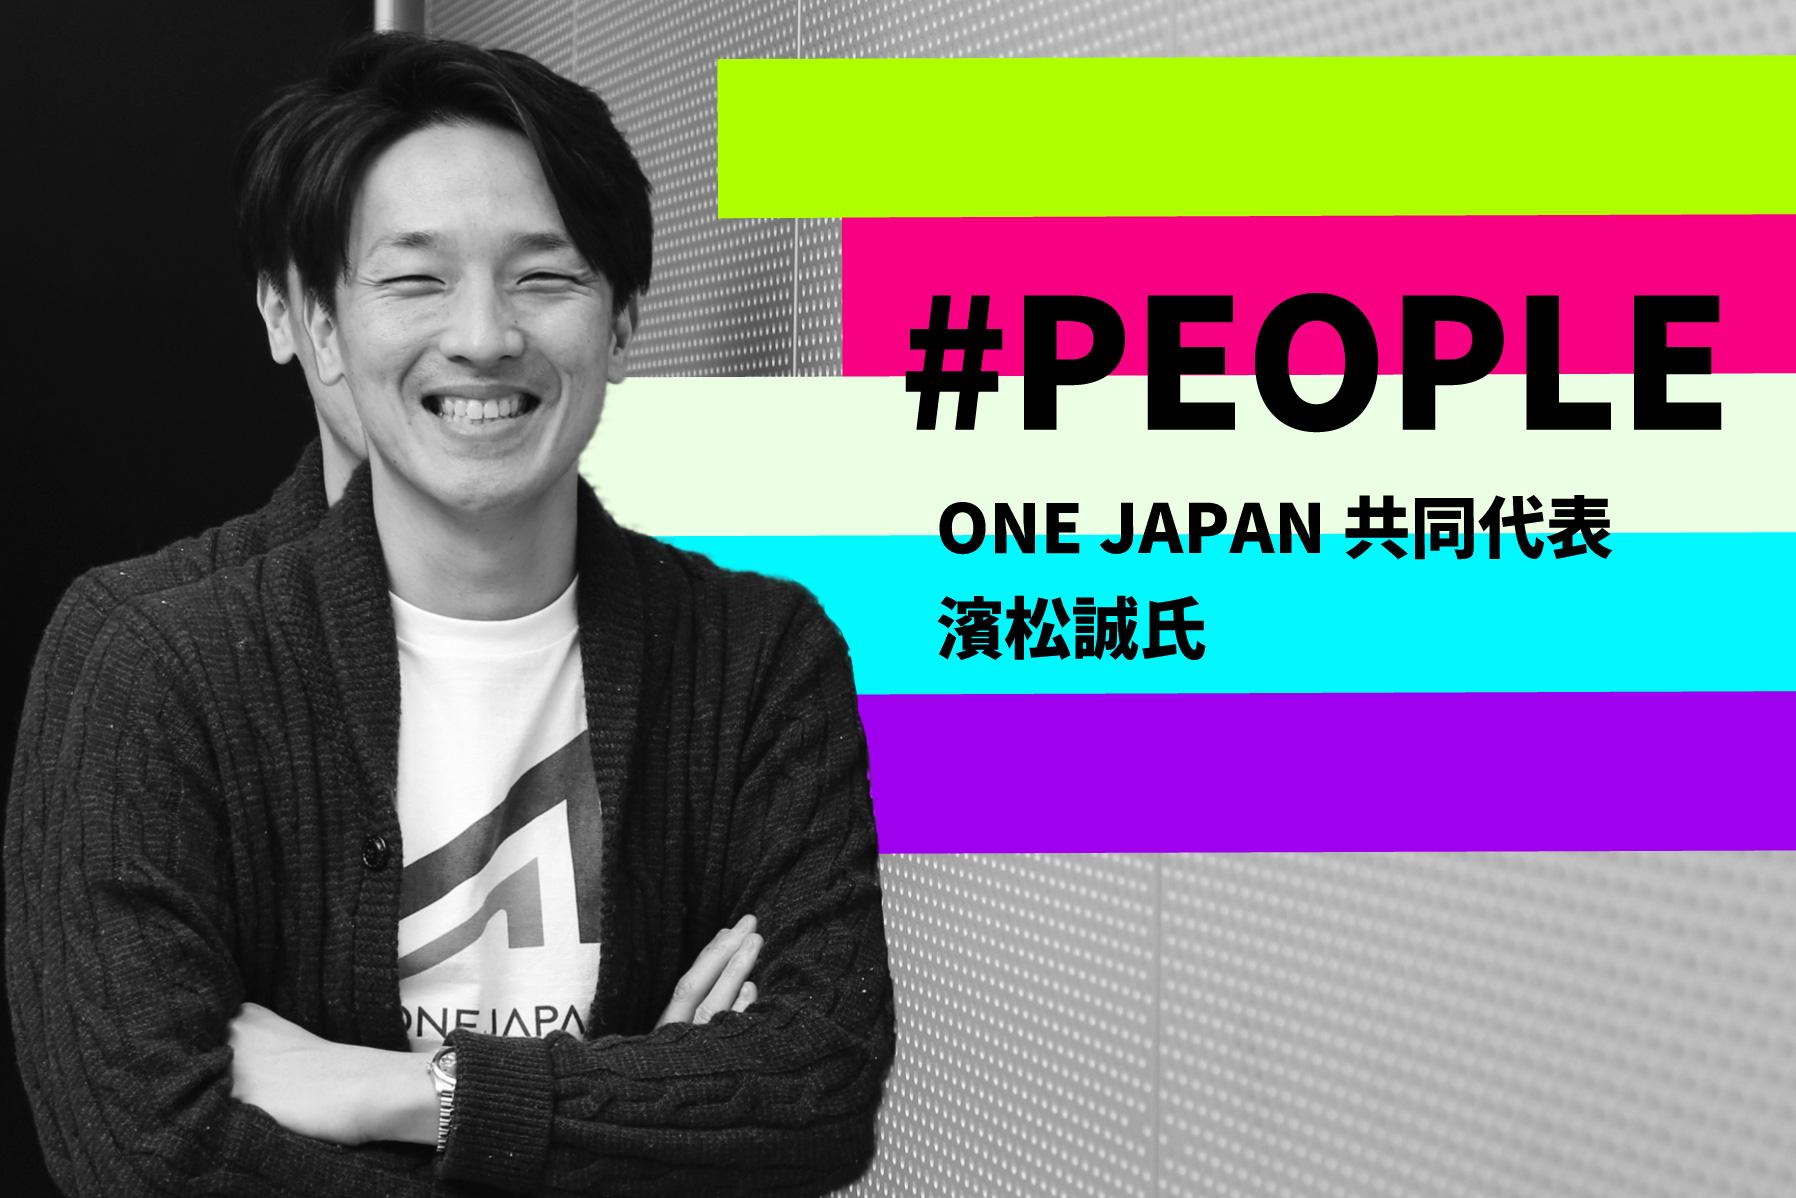 #PEOPLE | ONE JAPAN・濱松氏に聞く「大企業の空気を変える術」とは